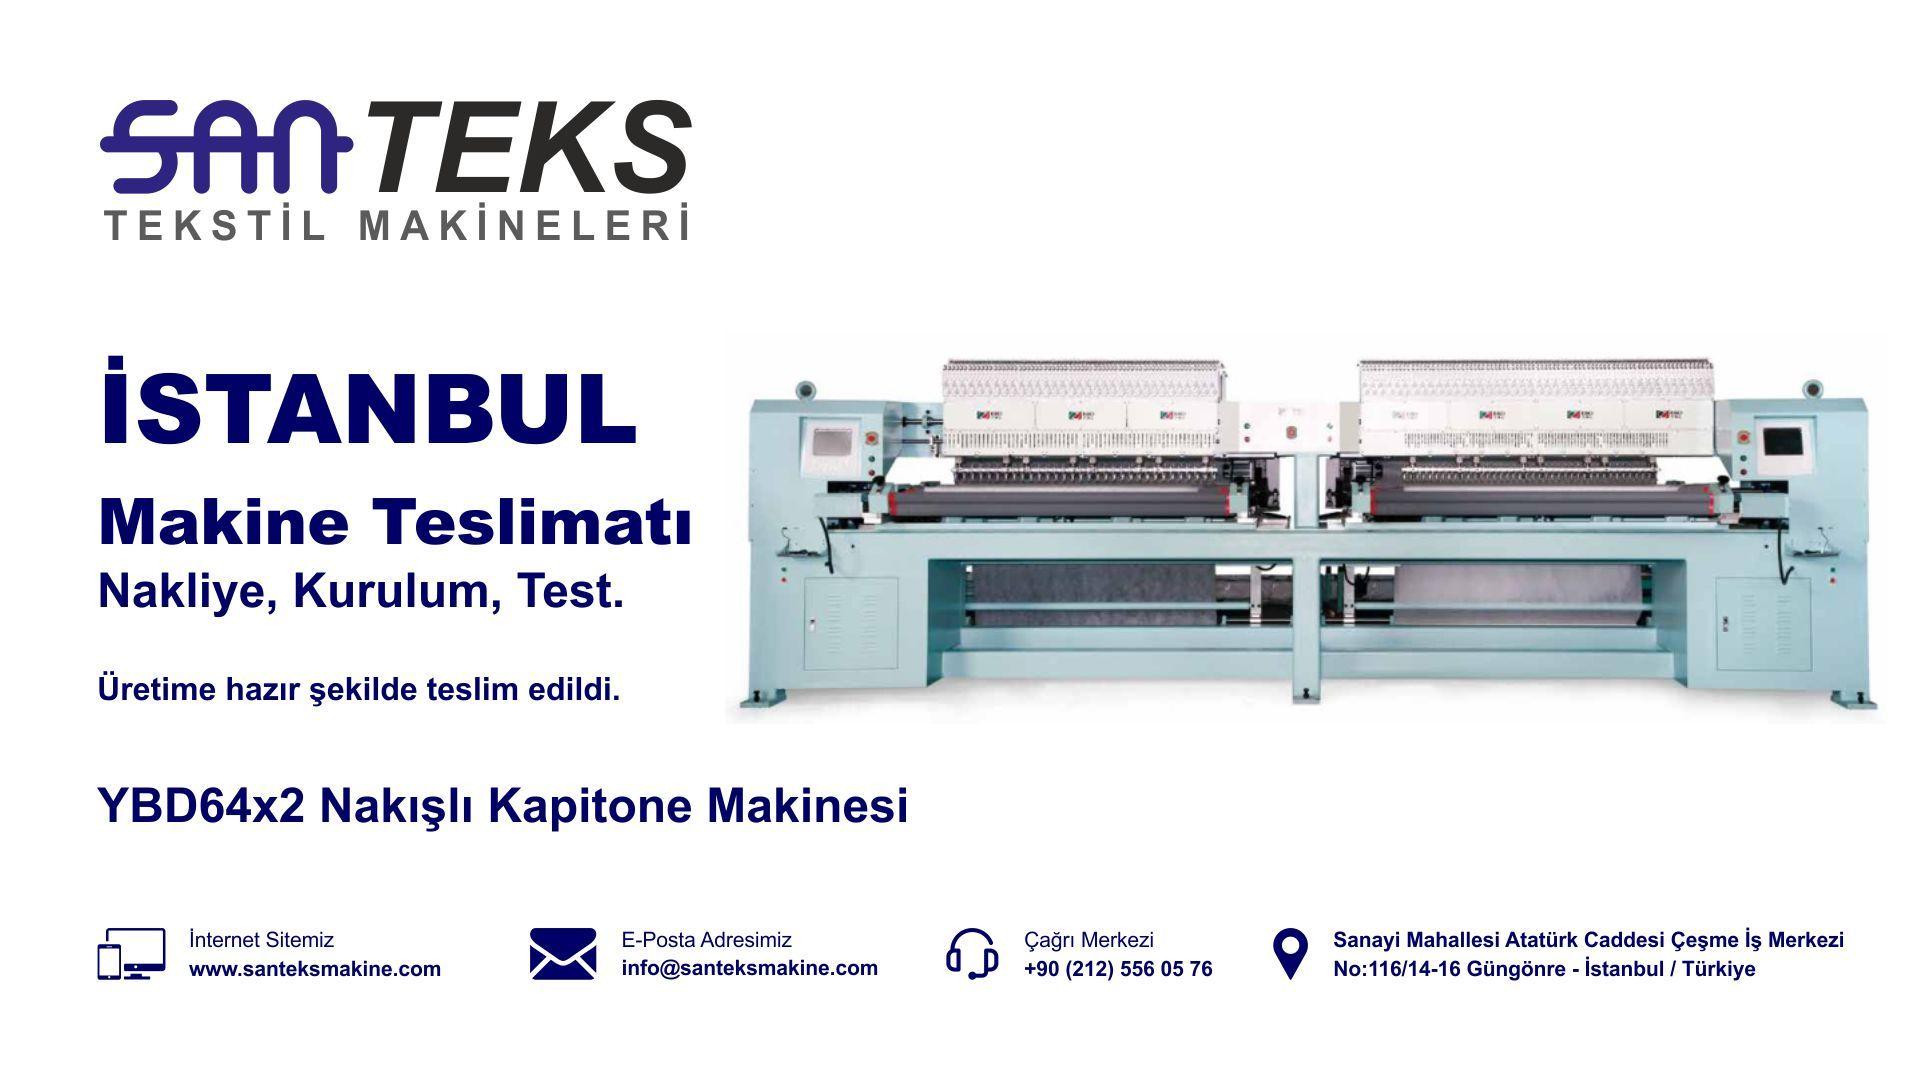 YBD64x2 Nakışlı Kapitone Makinesi - İstanbul Teslimat